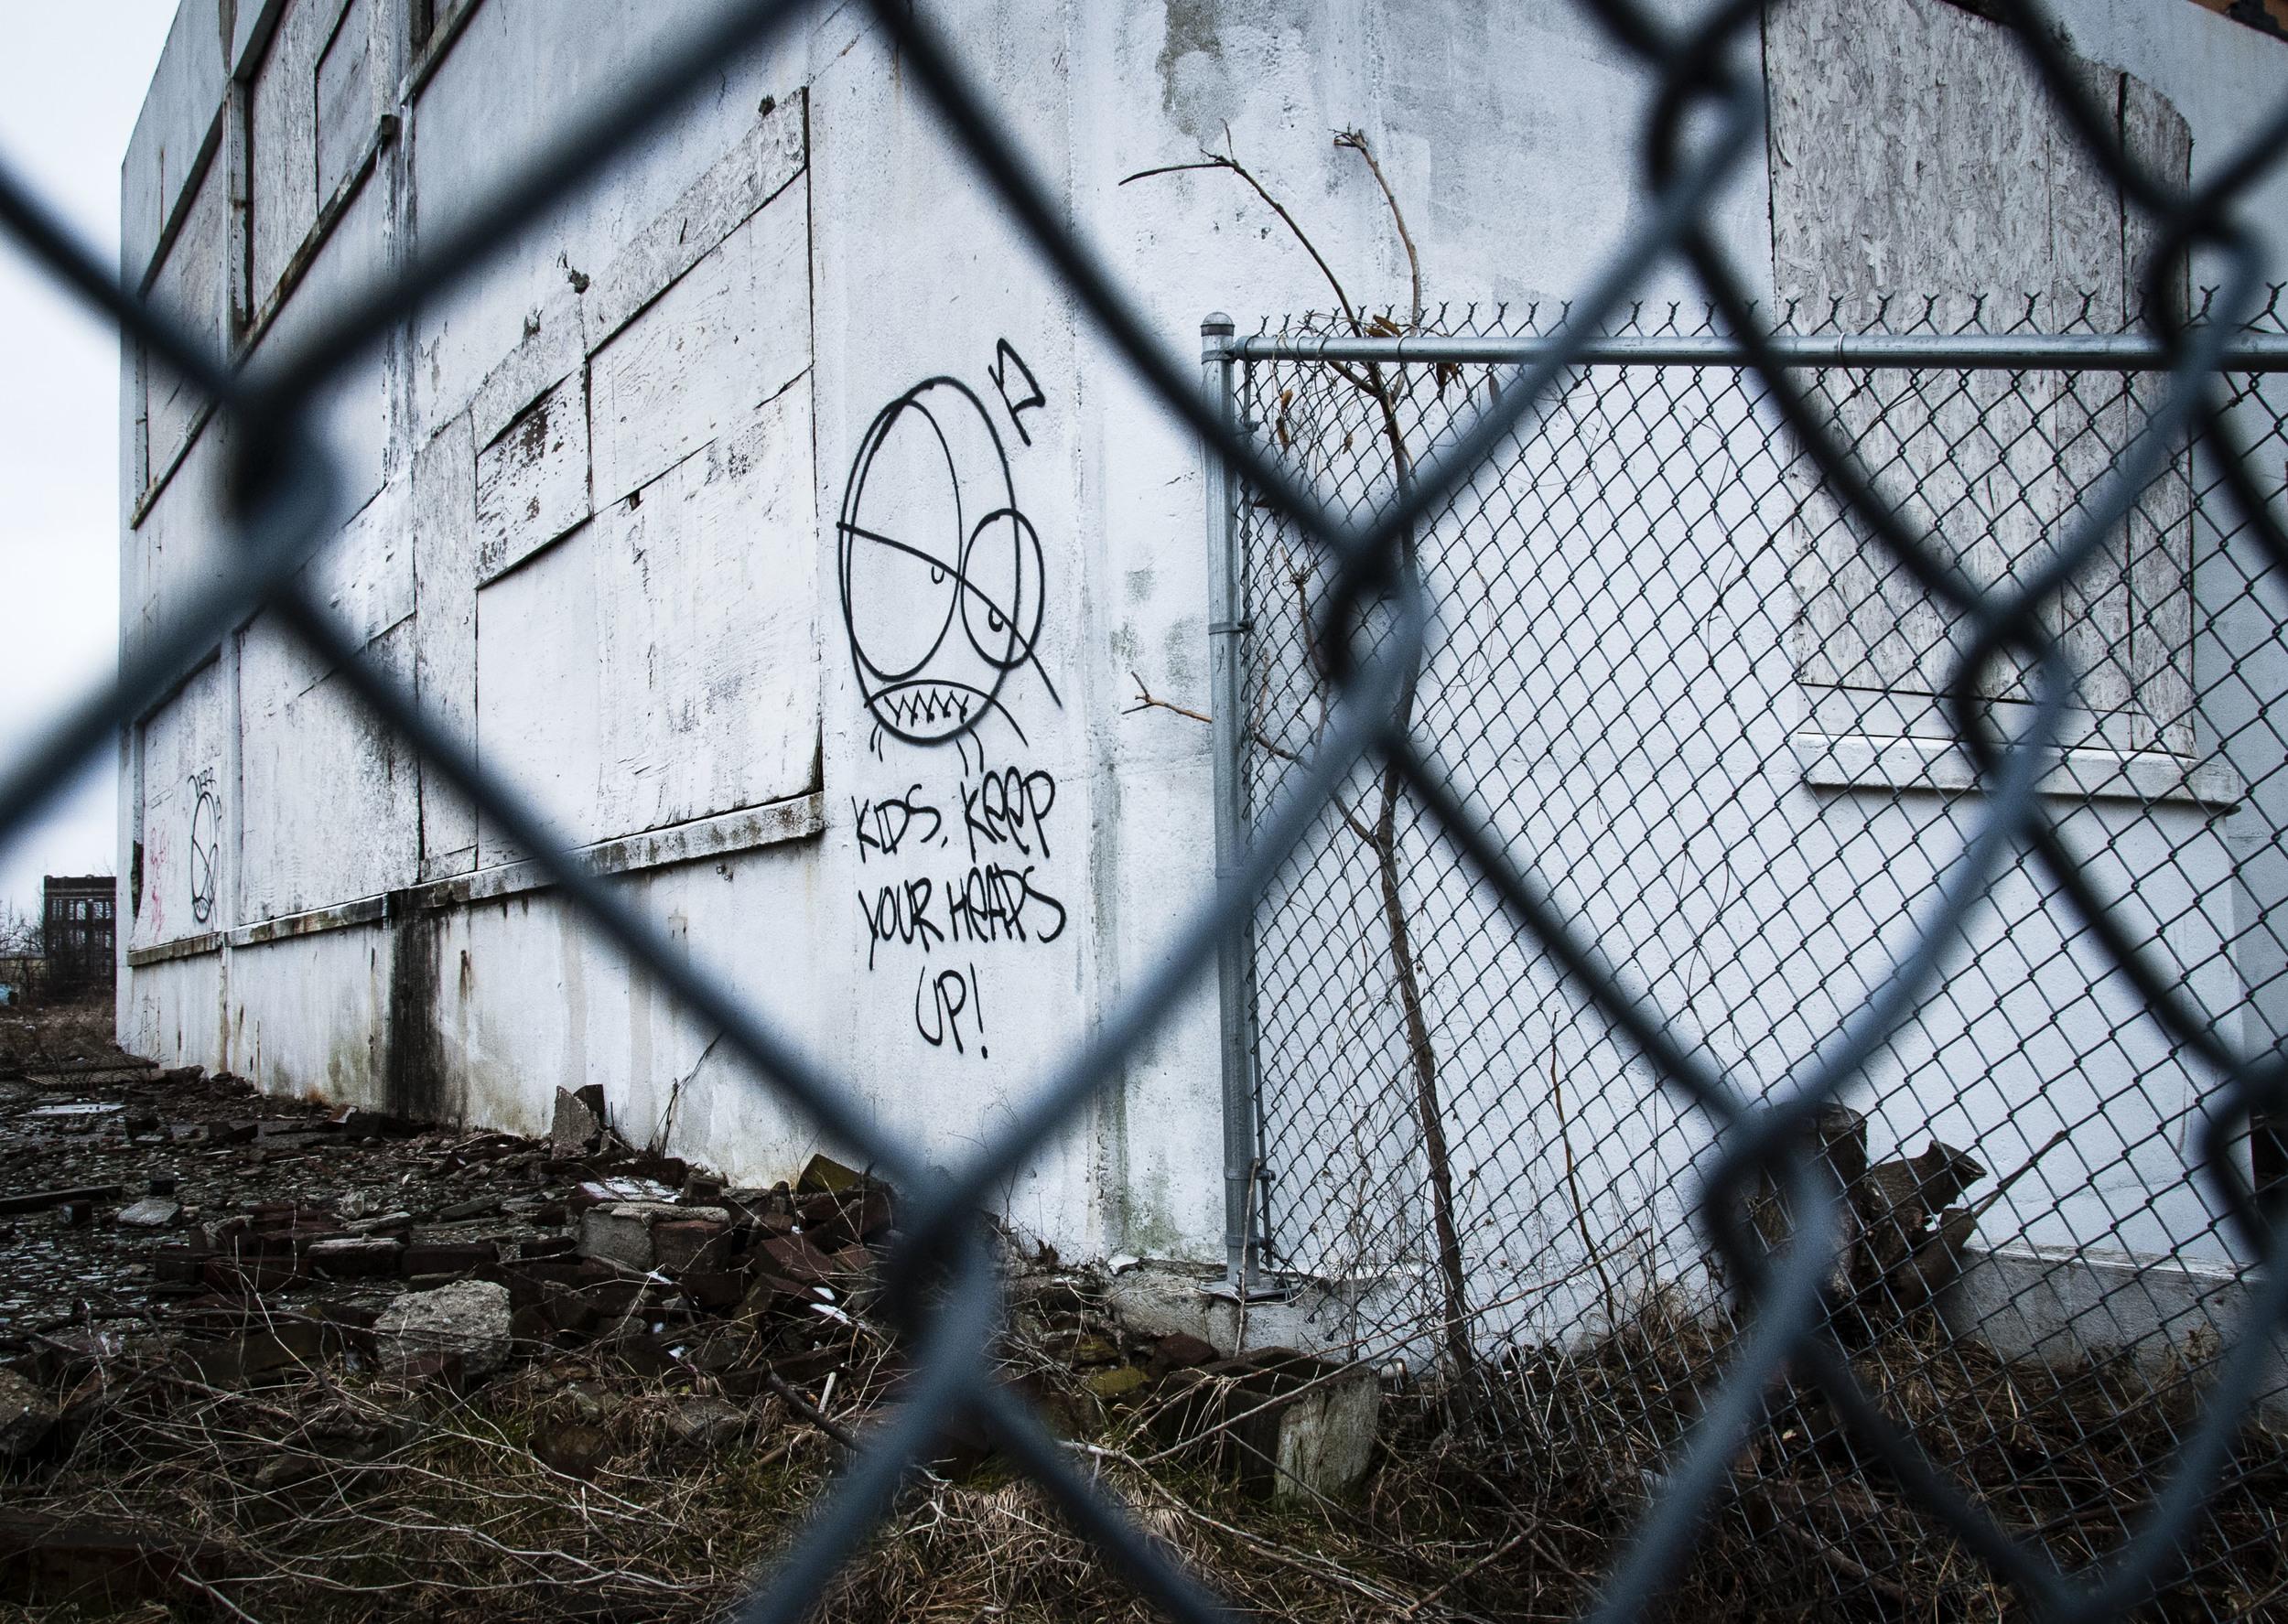 001-181311-0413-abandoned.jpg